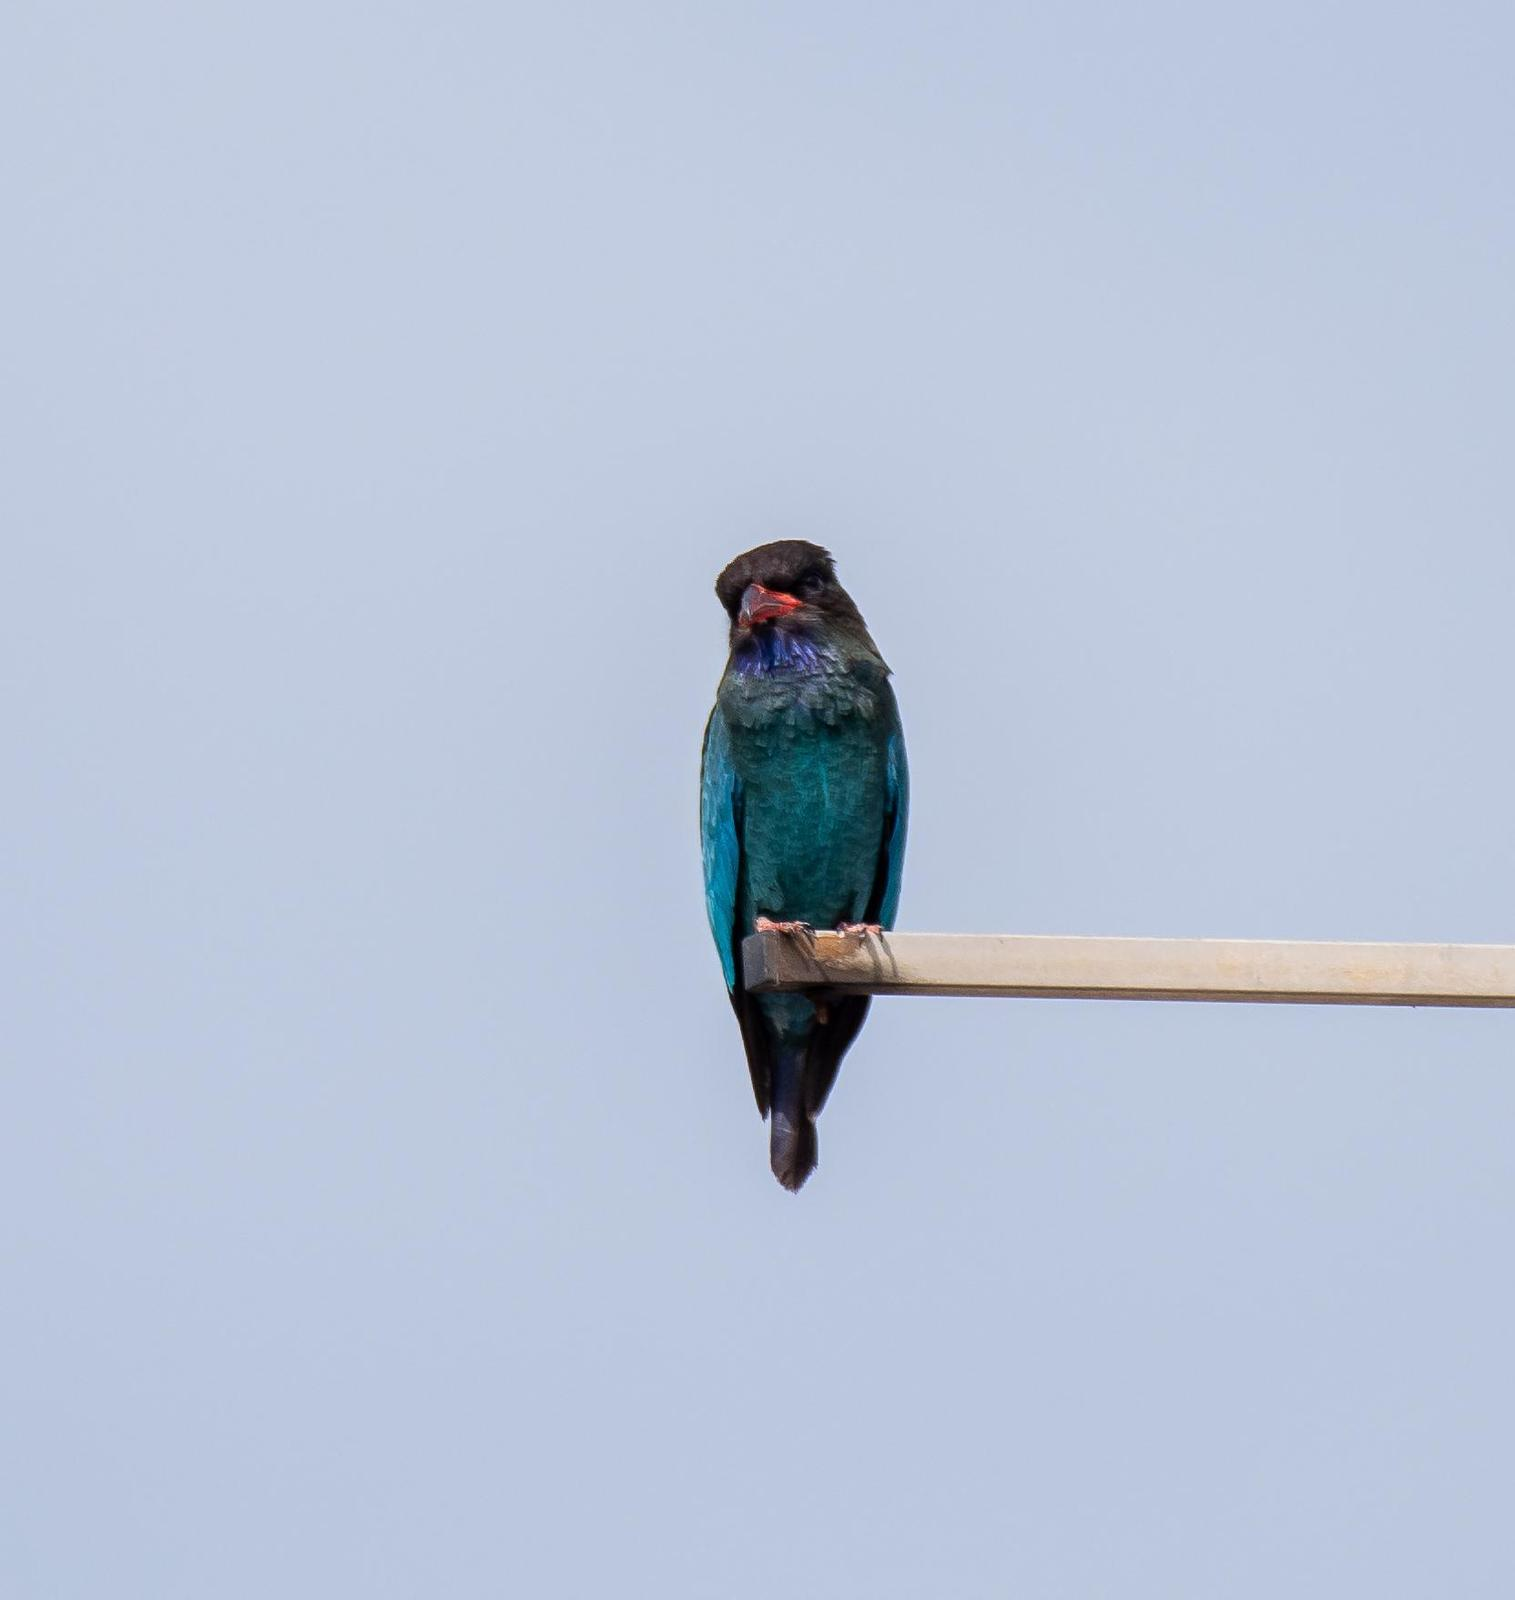 Dollarbird Photo by Yvo Goossens